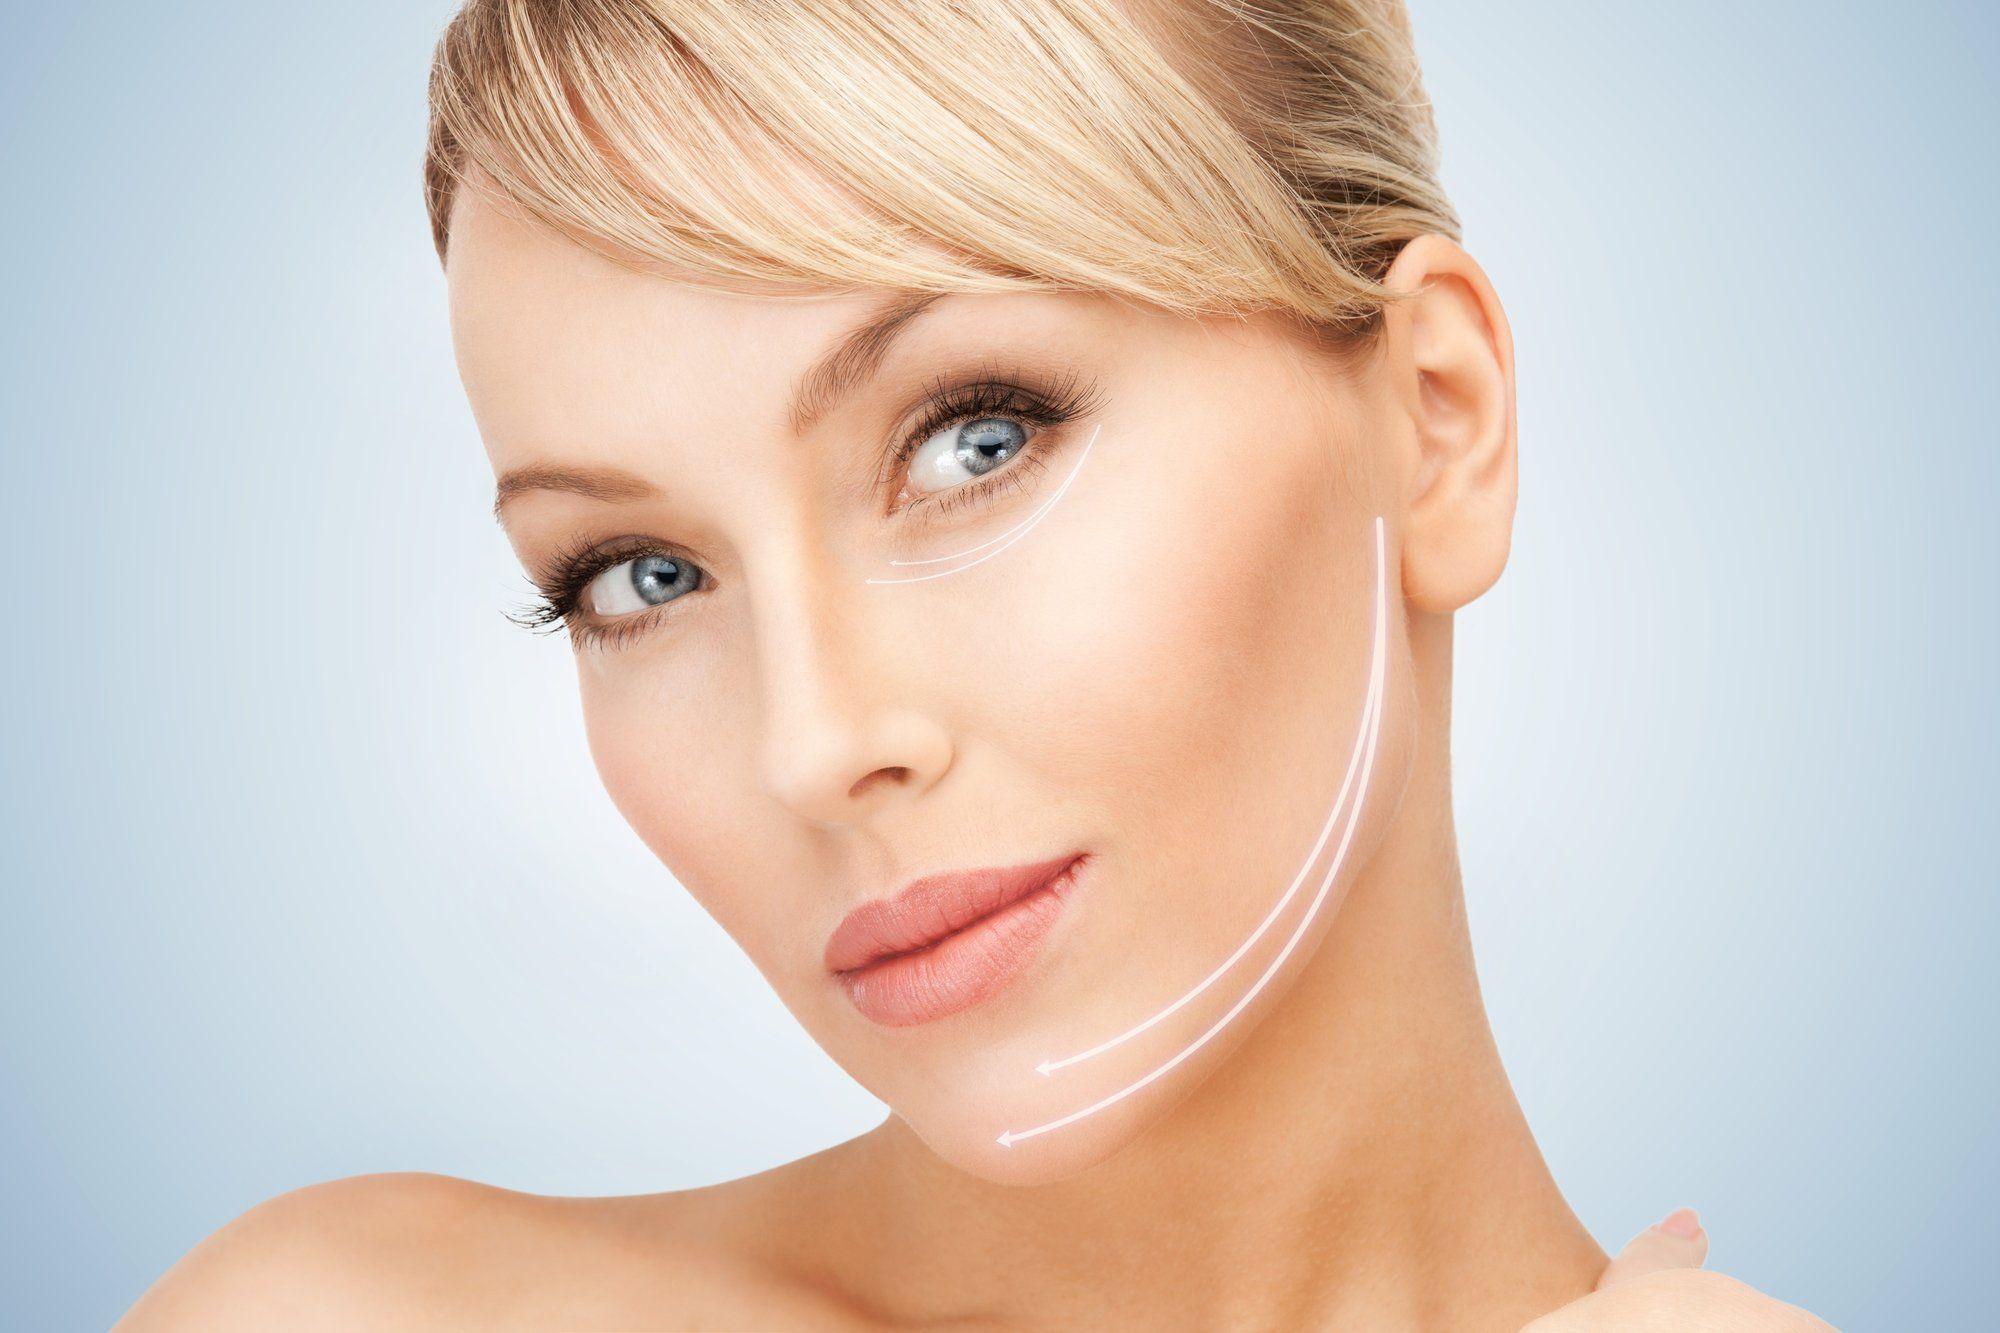 S'Mores reccomend Center for facial cosmetic